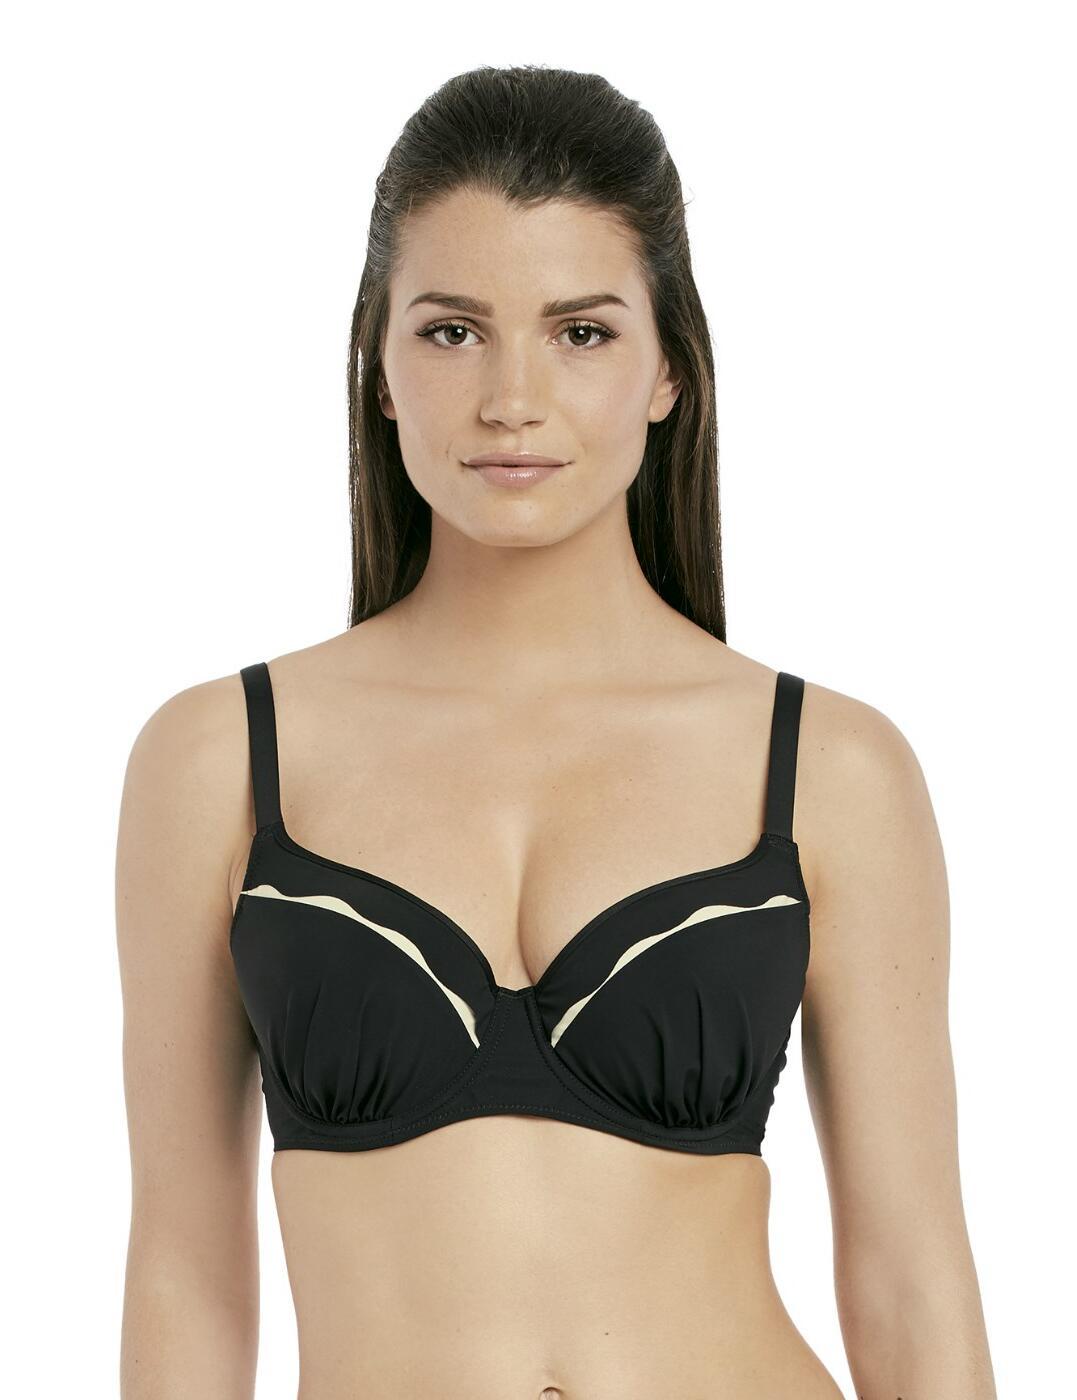 6232 Fantasie Sainte Maxime Underwired Gathered Moulded Bikini Top - 6232 Black/Cream